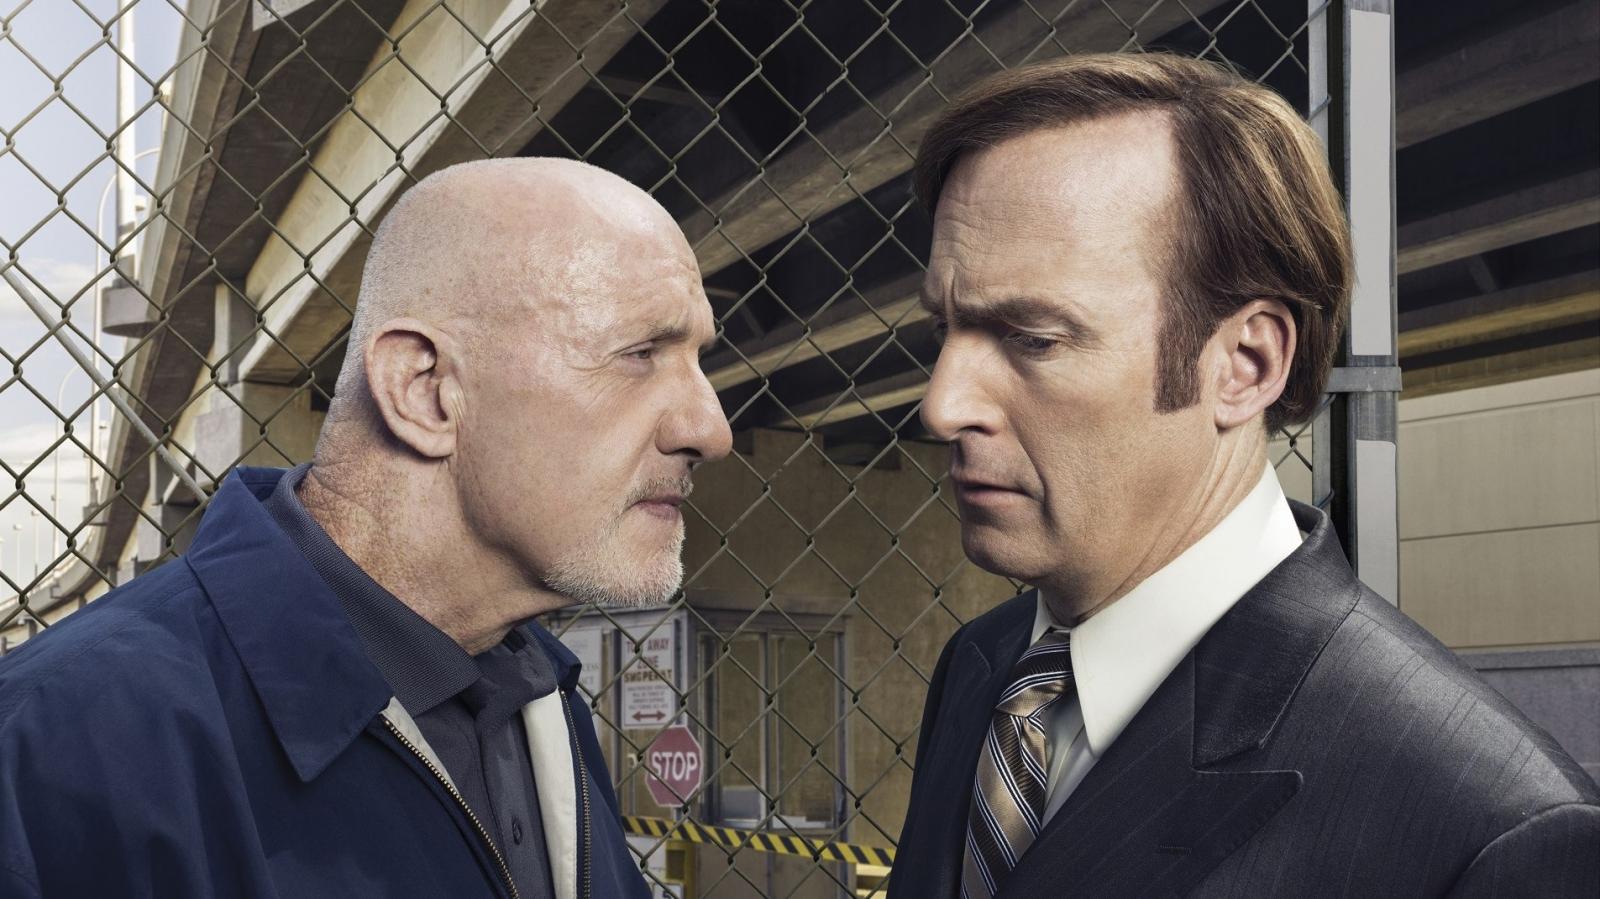 Better call Saul finale